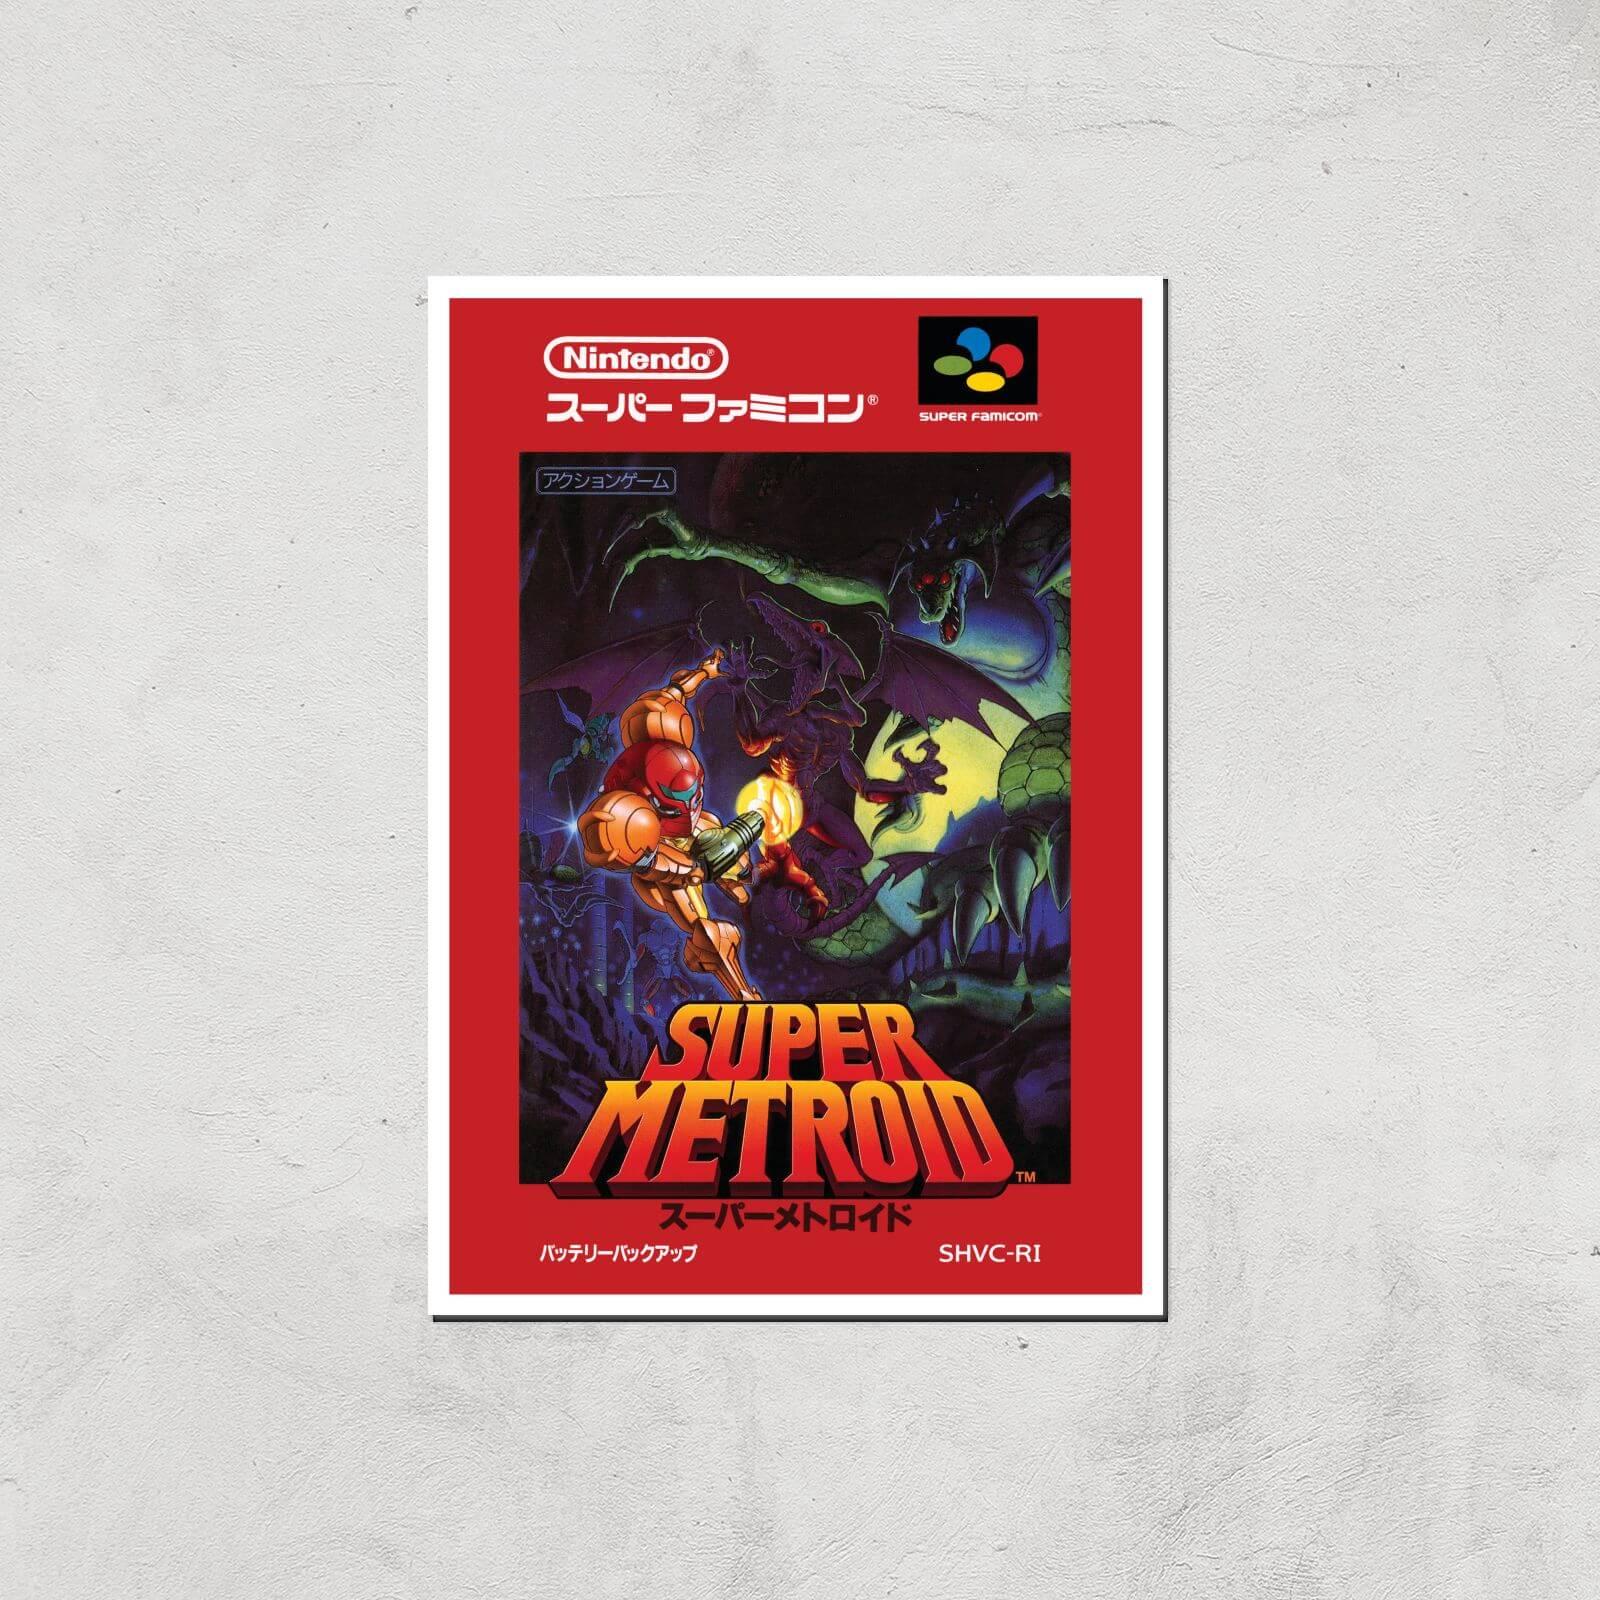 Nintendo Retro Super Metroid Cover Art Print - A4 - Print Only